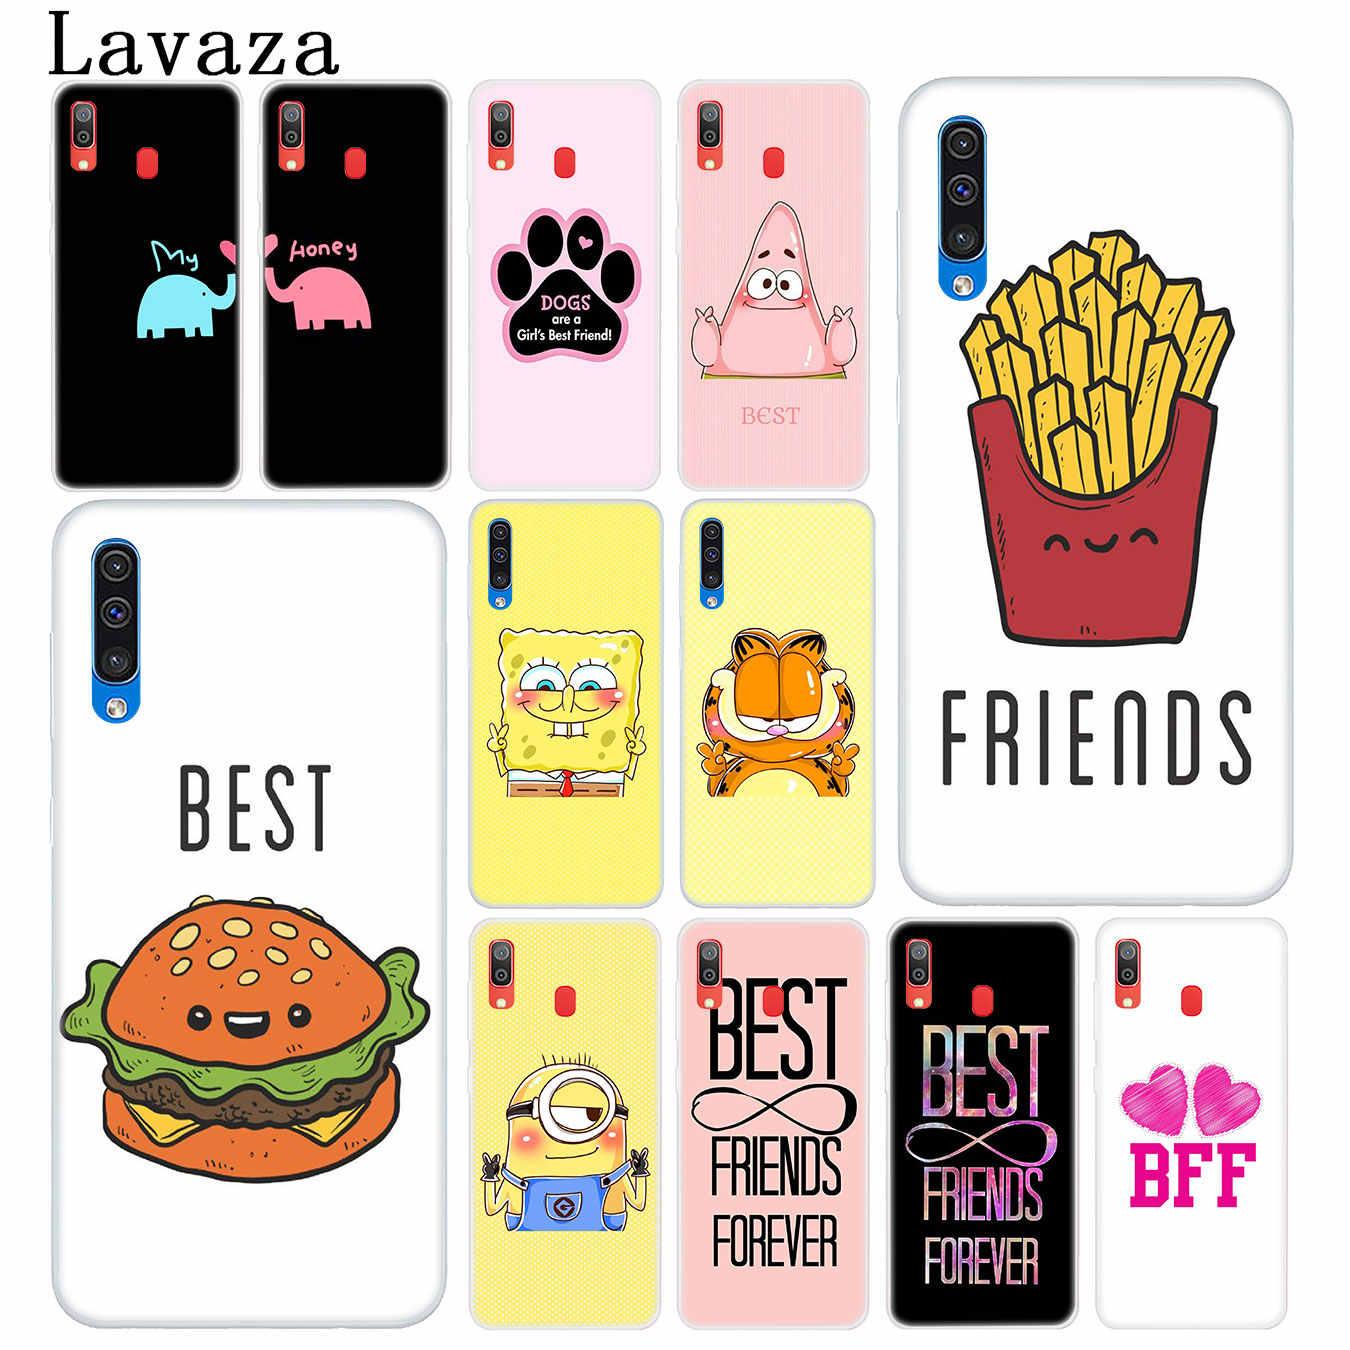 Lavaza أفضل الأصدقاء فتاة الصلب شفافة الهاتف حقيبة لهاتف سامسونج غالاكسي A10 A20 A30 A40 A50 A60 A70 M10 M20 M30 M40 A20e غطاء